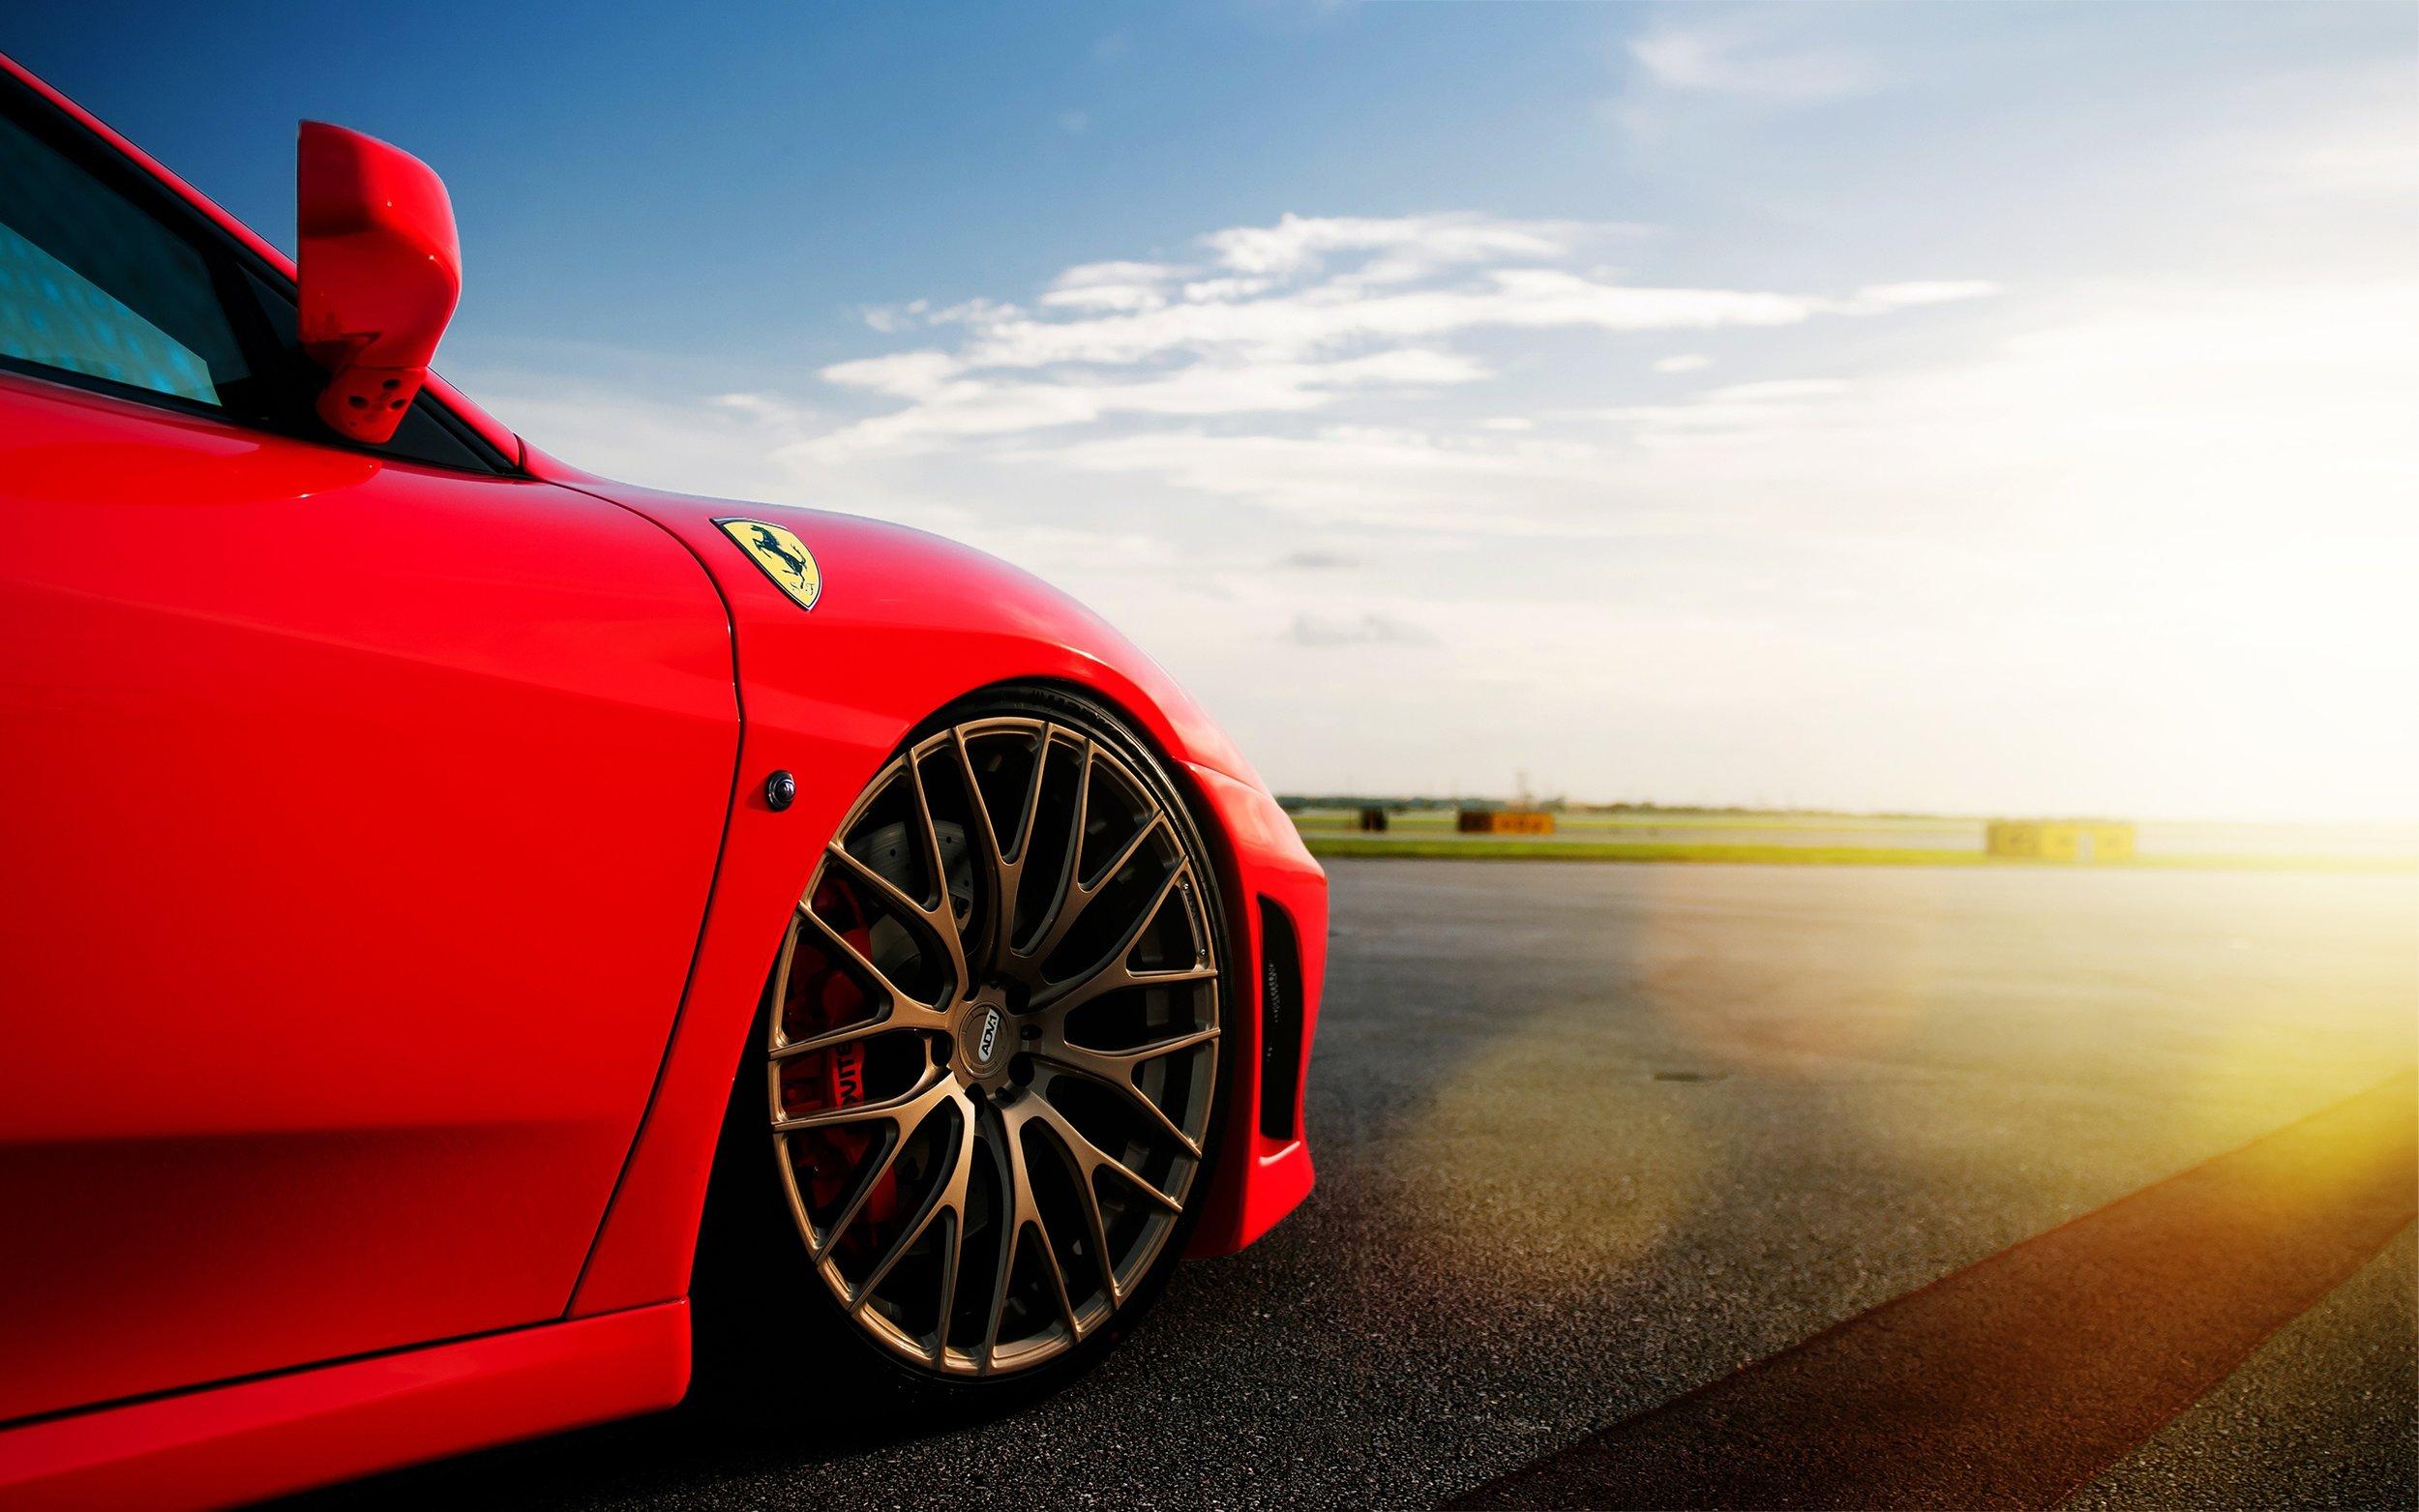 Ferrari-Wallpaper-3.jpeg